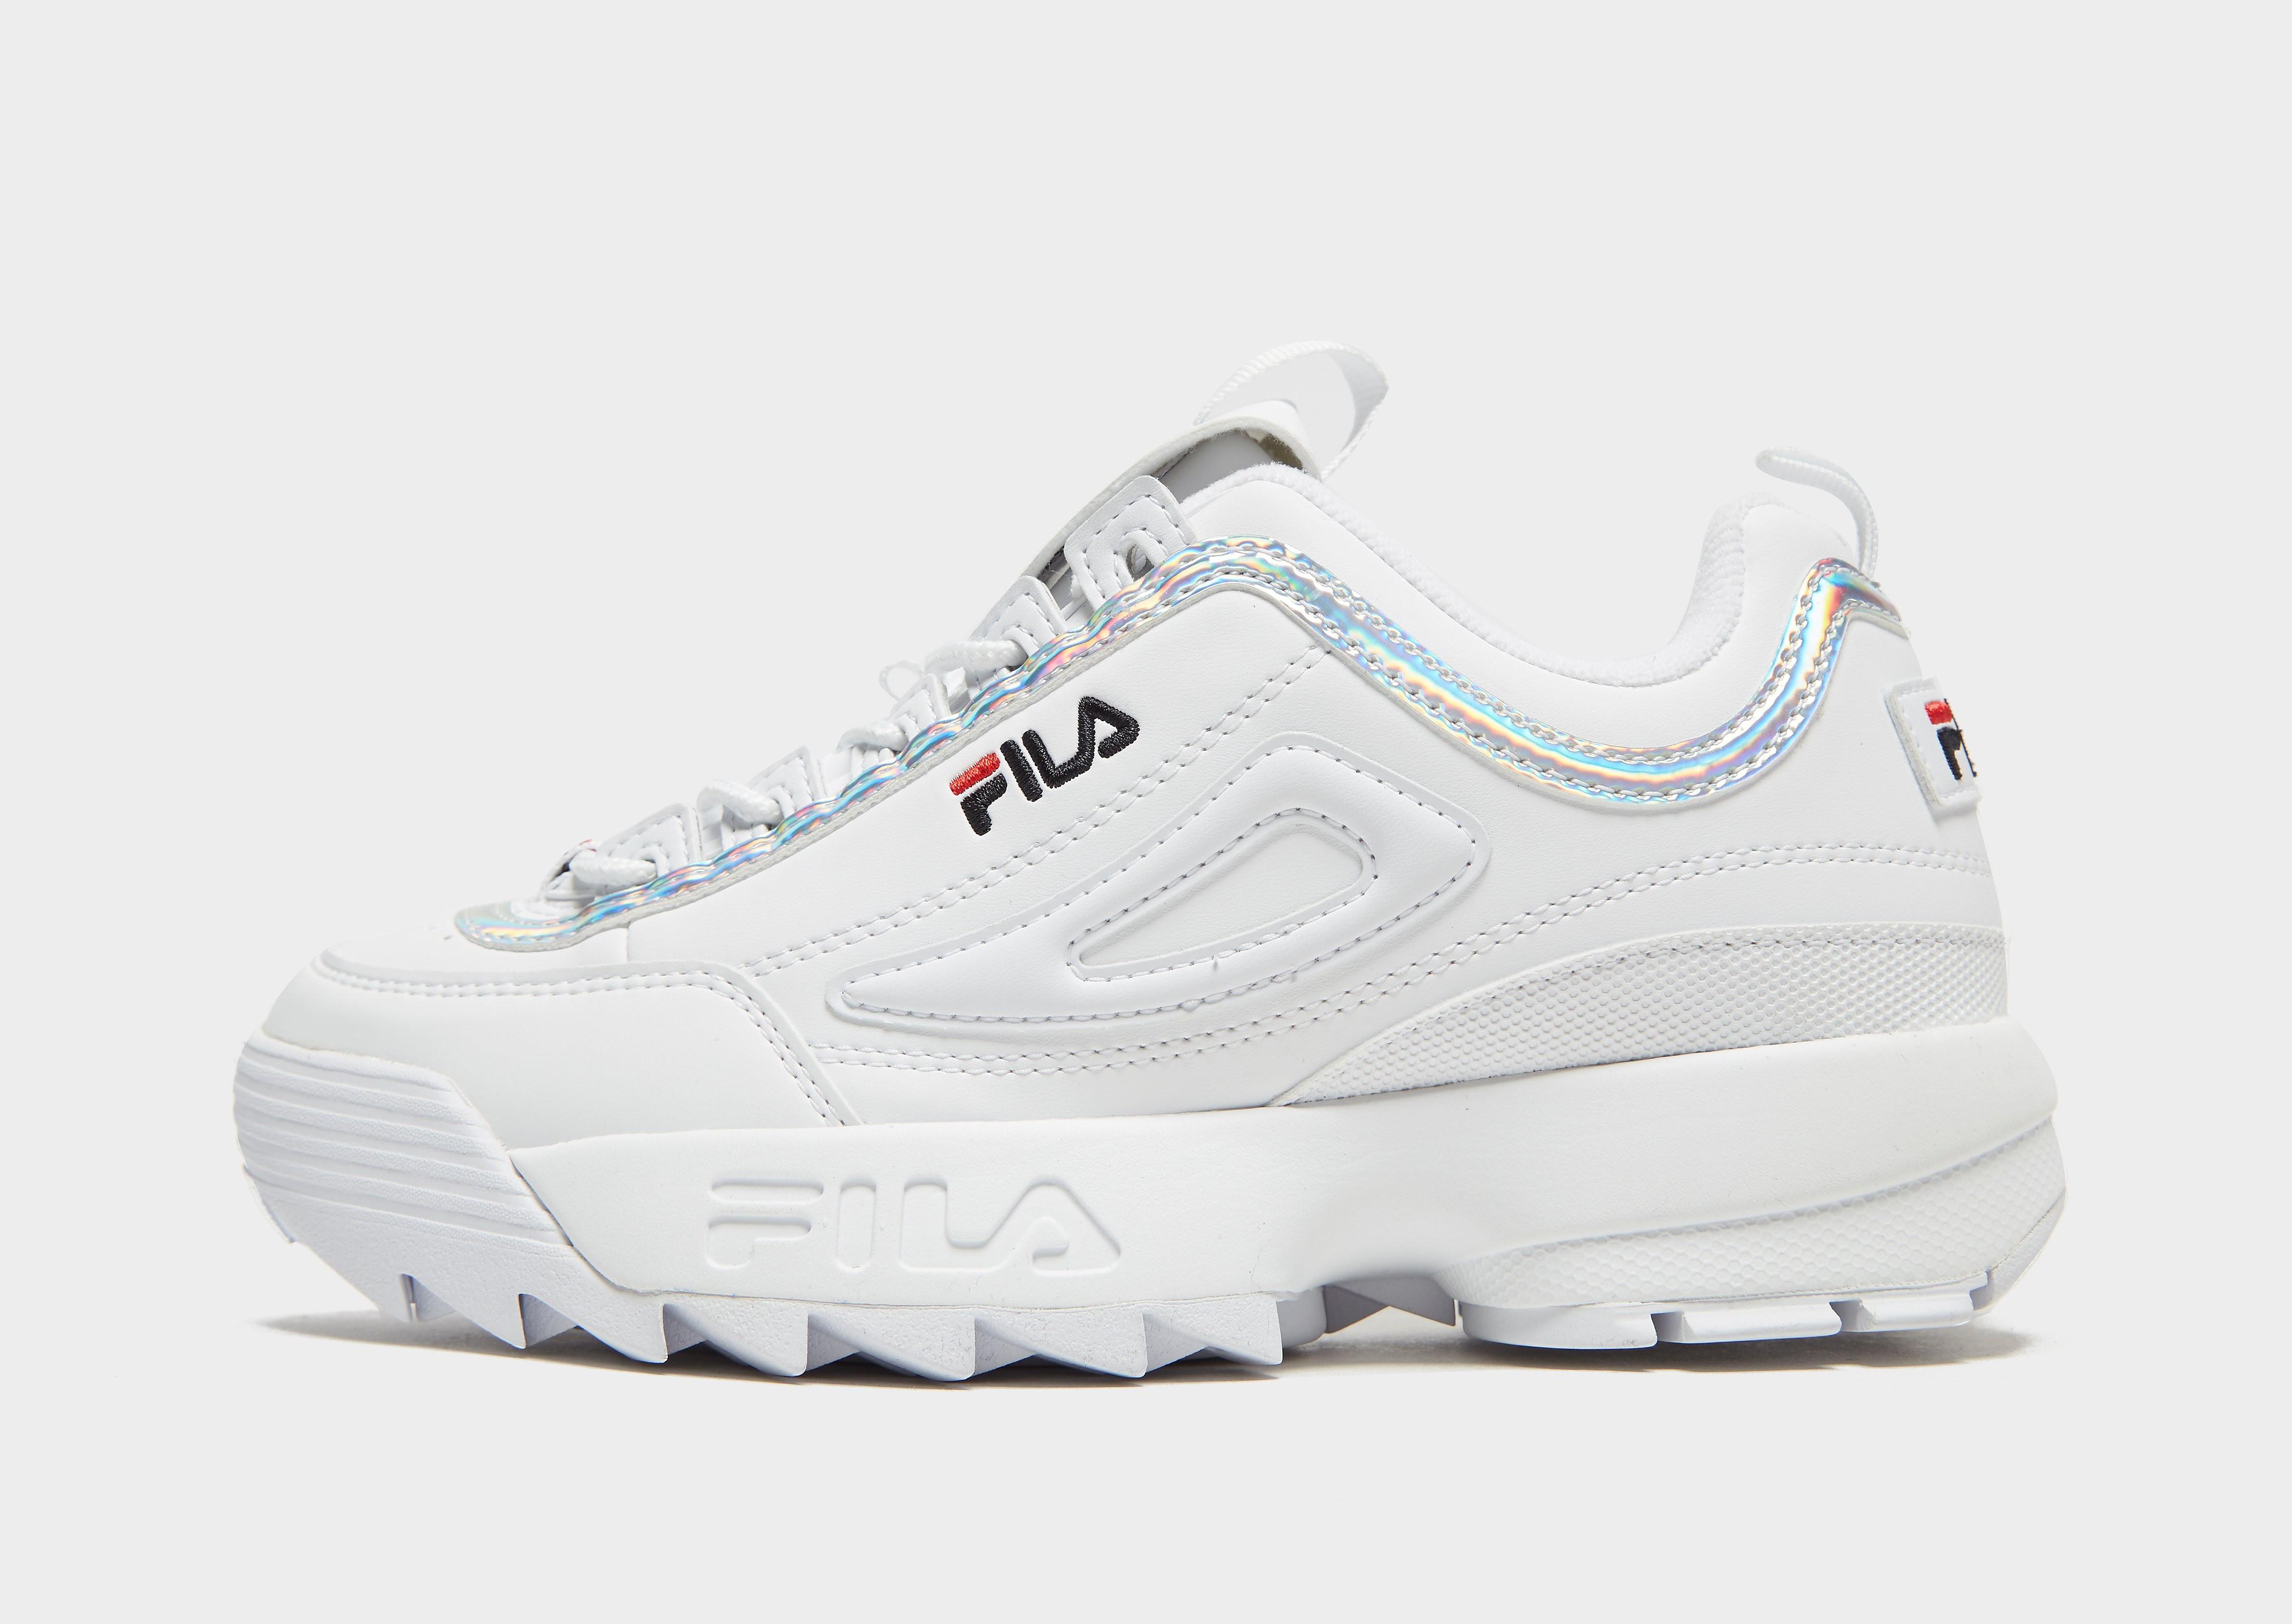 Sneaker Fila Fila Disruptor II Junior - Only at JD